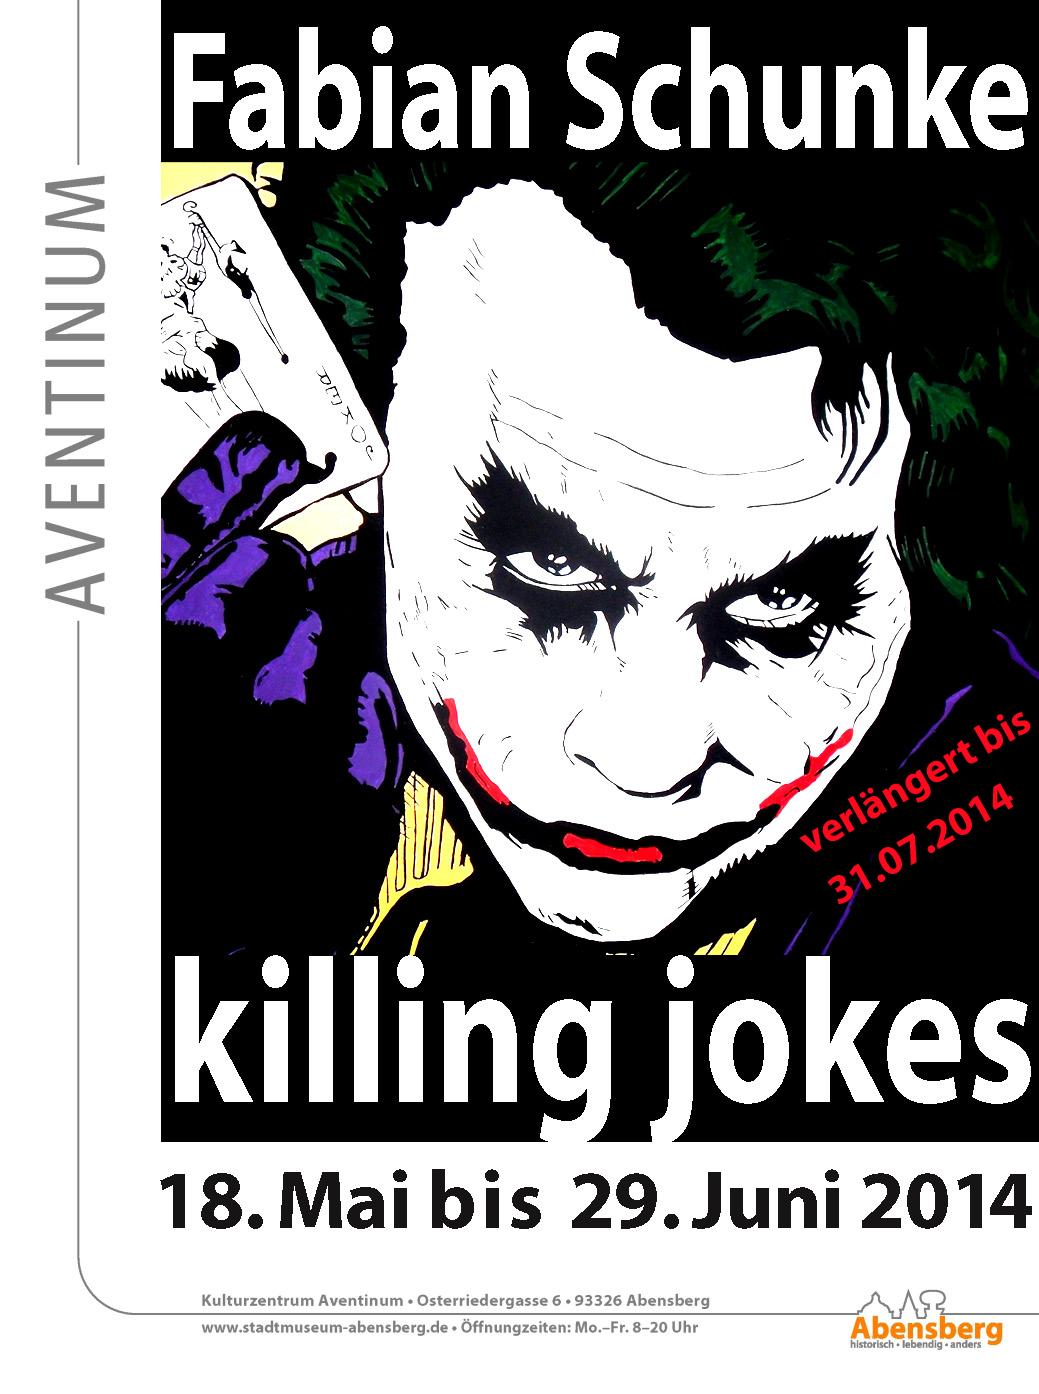 Fabian Schunke – killing jokes bis 31.07.2014 verlängert!